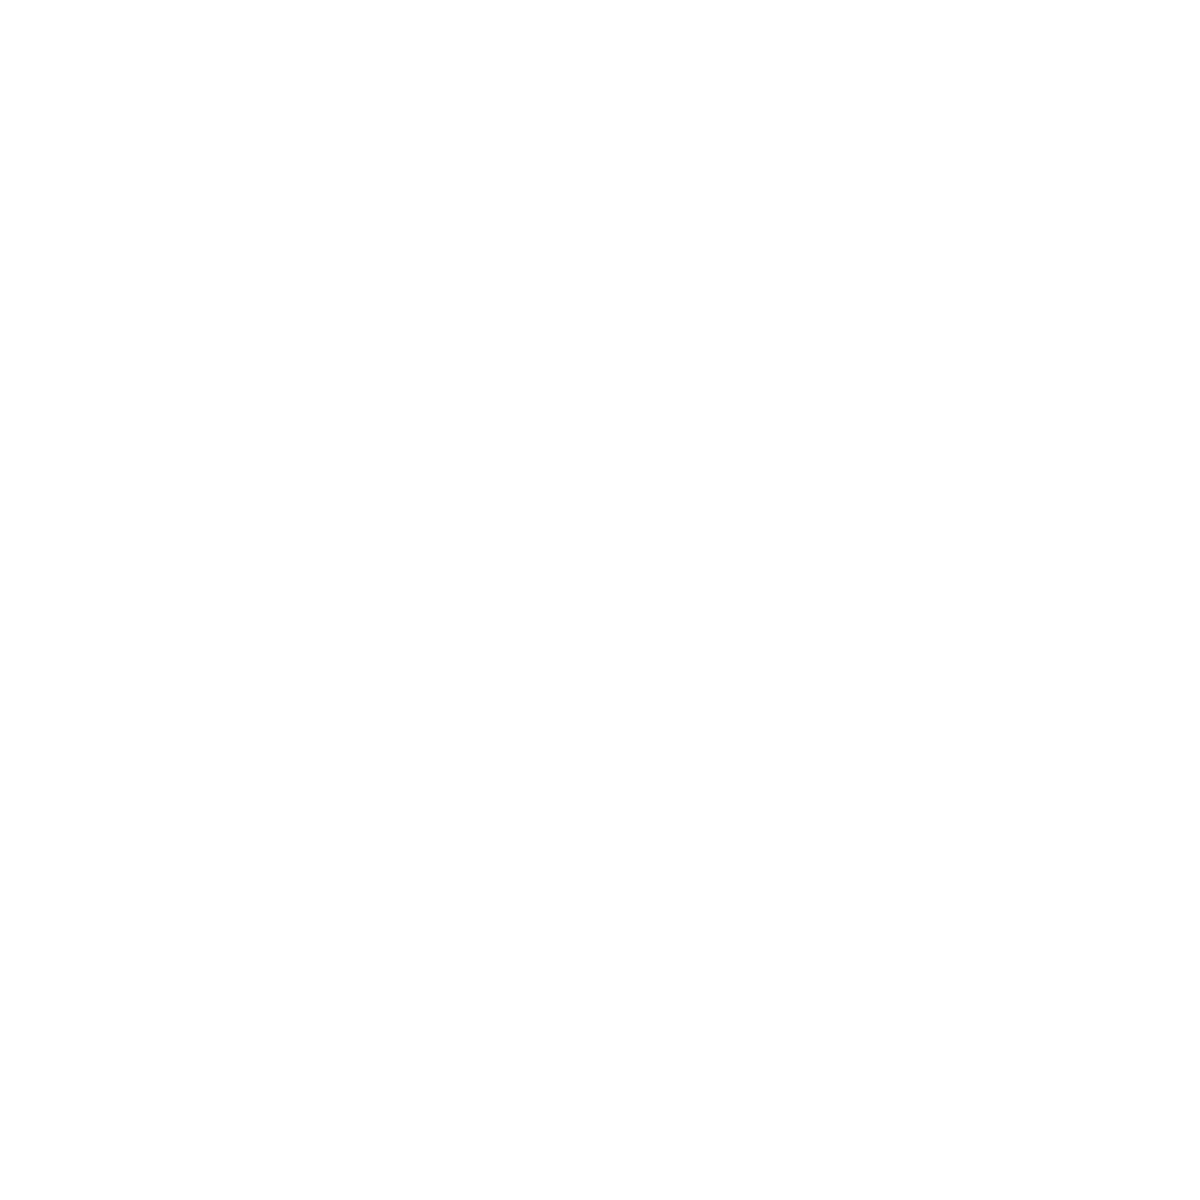 Tomoko answers date simgirl Tomoko Saeki:Name:TSPhone:090